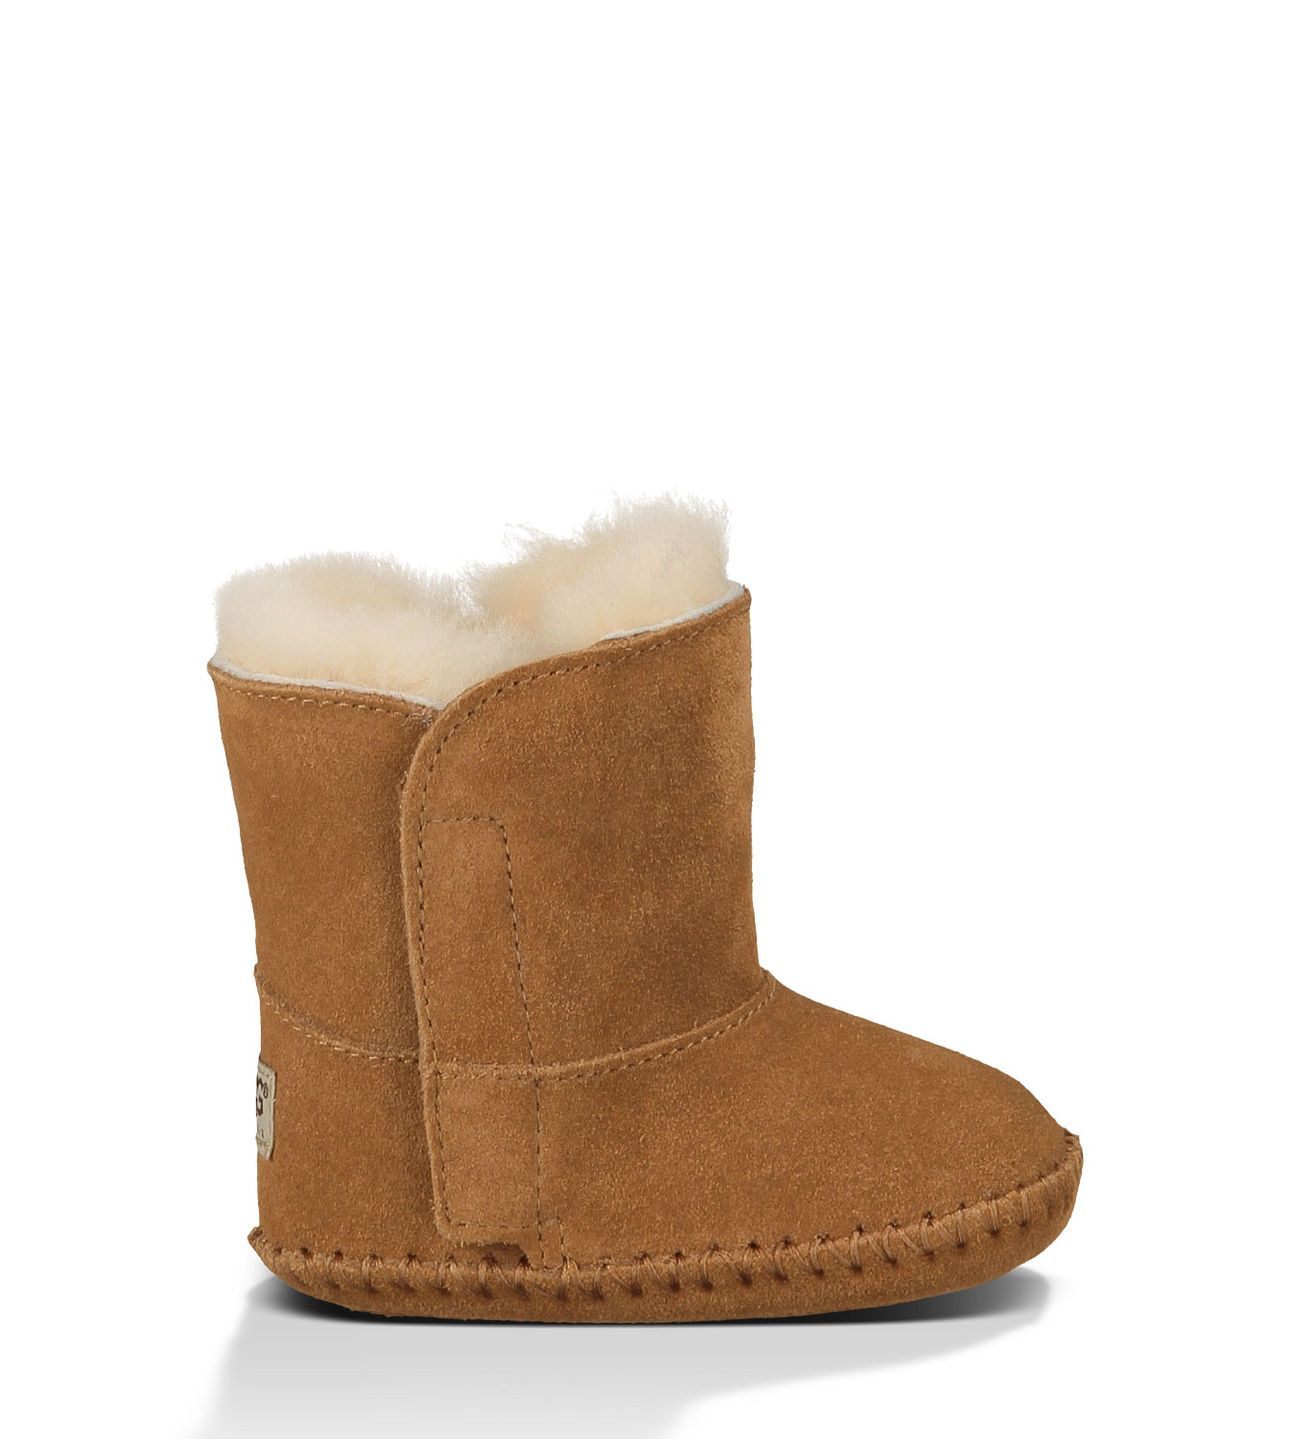 Ugg Caden For Infants Free Shipping At Uggaustralia Com Boots Uggs Ugg Boots